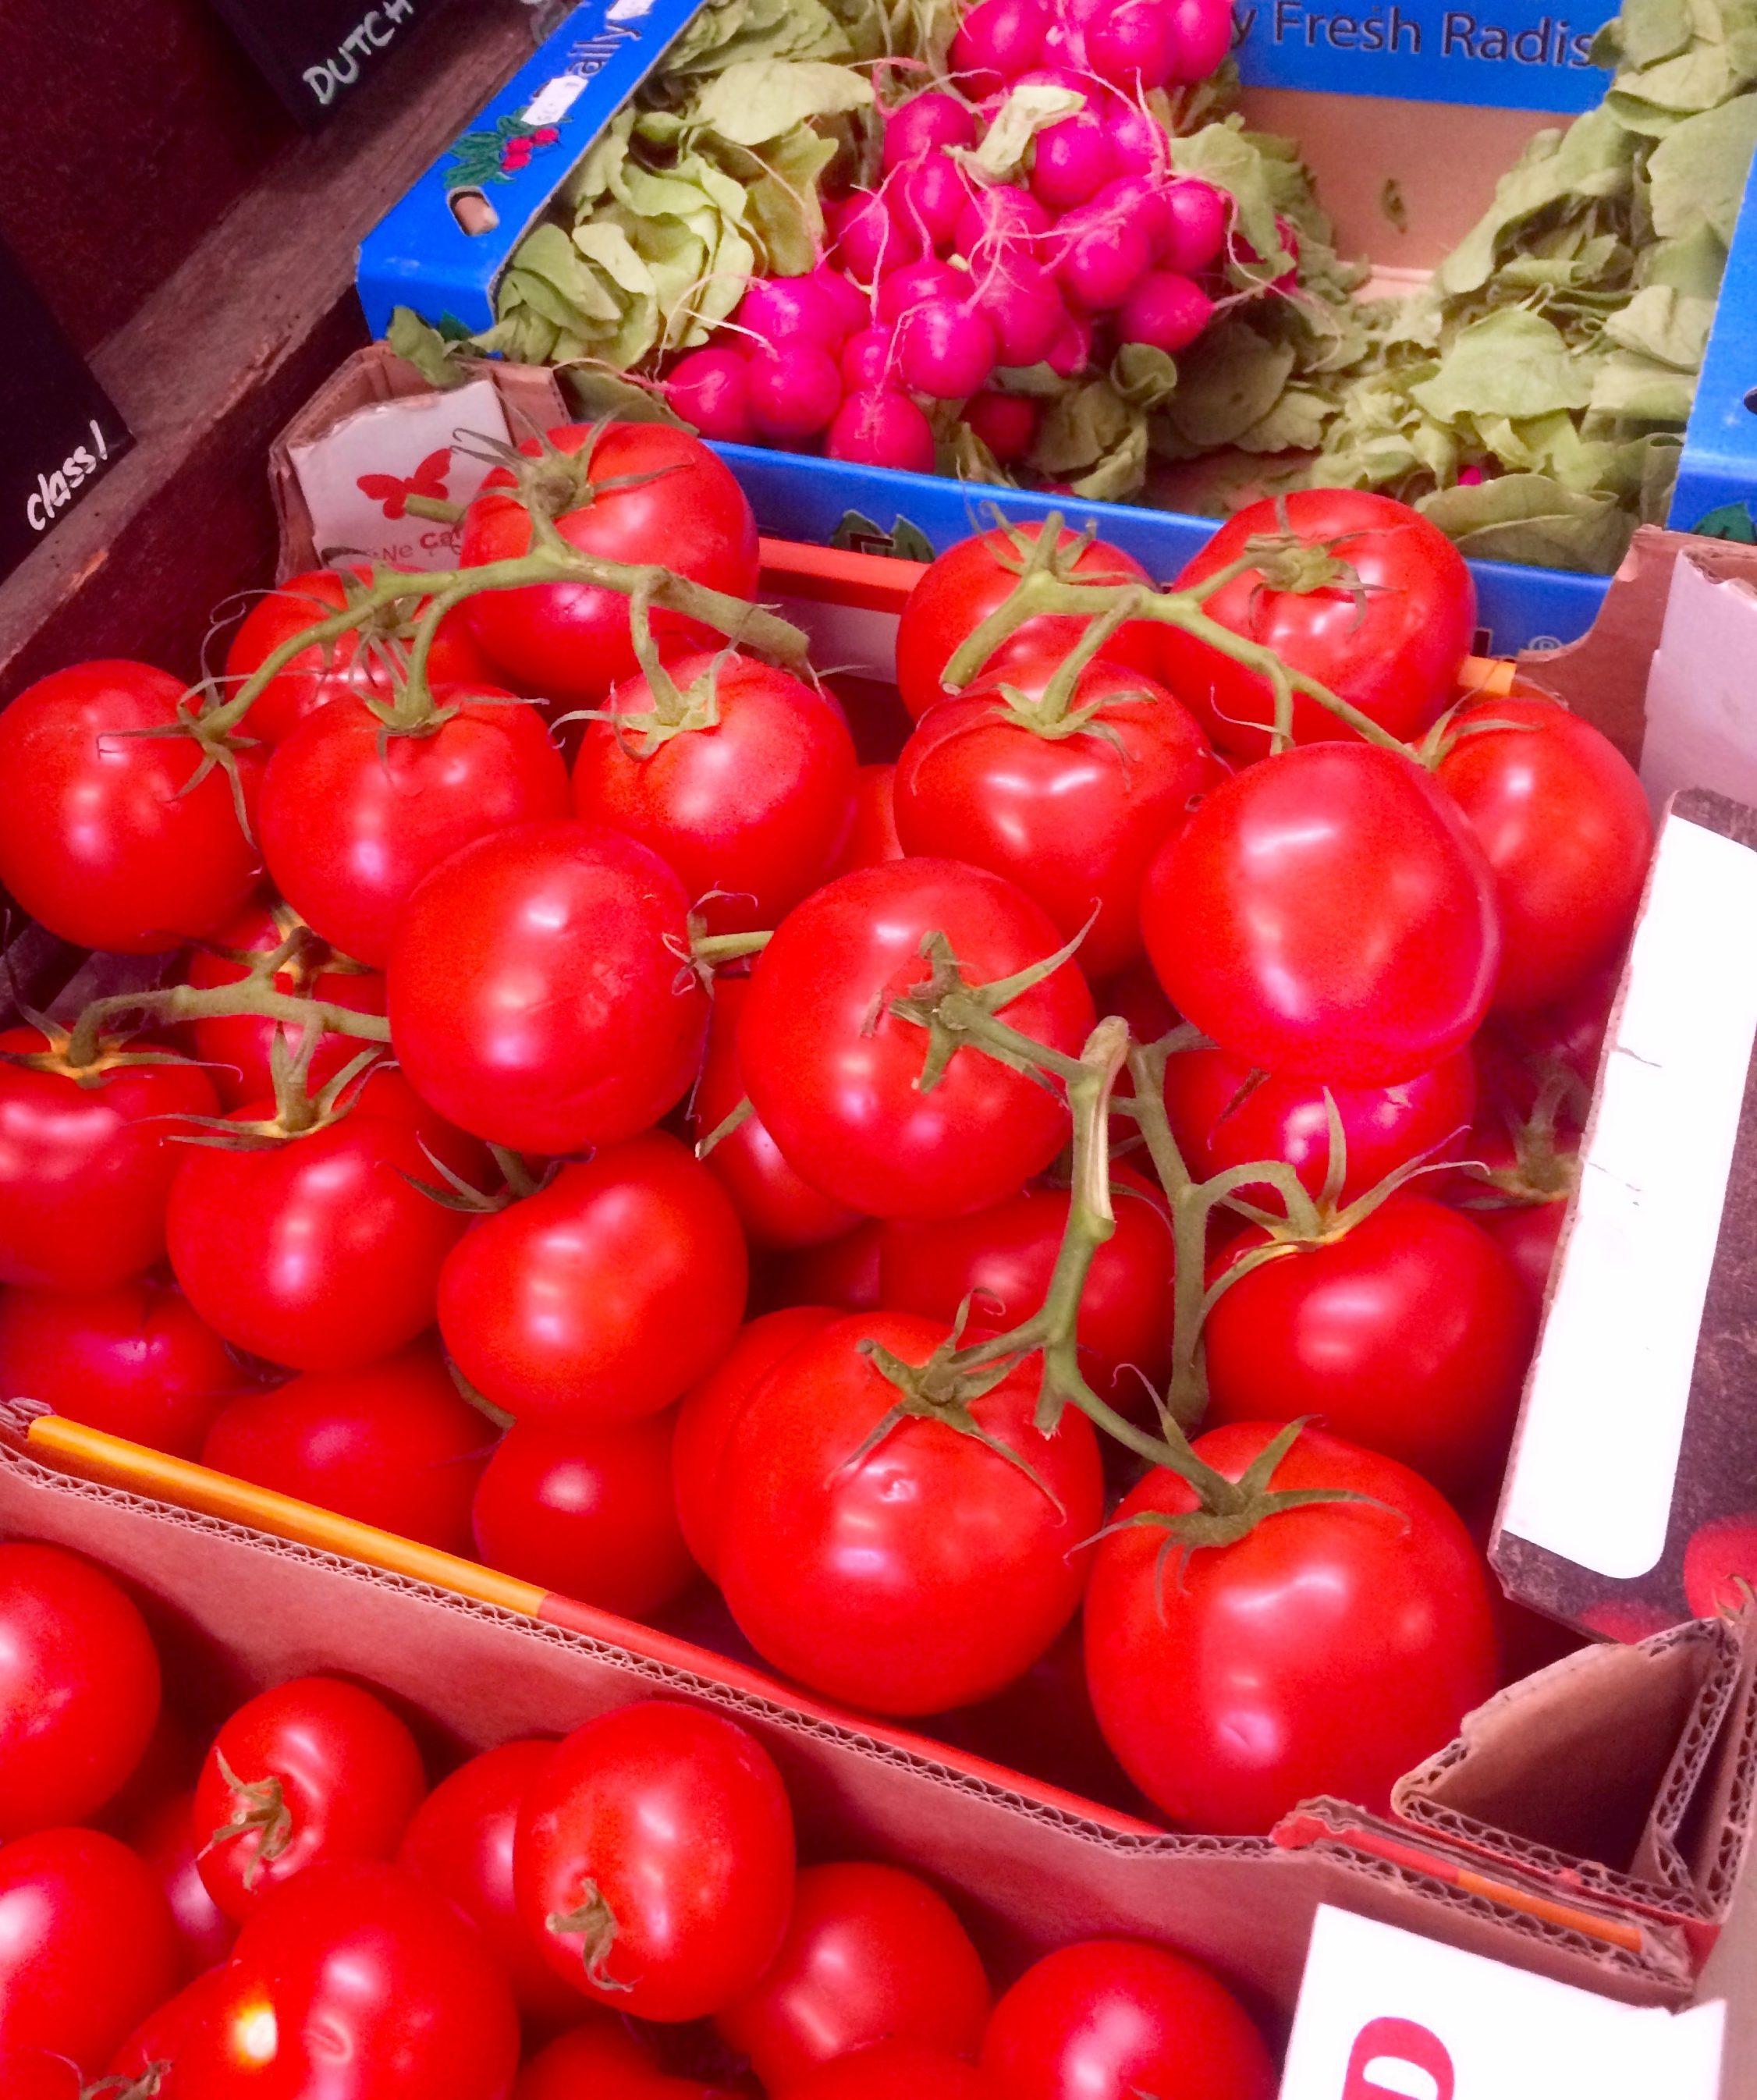 Weekend Farmers Market Free Listings directory